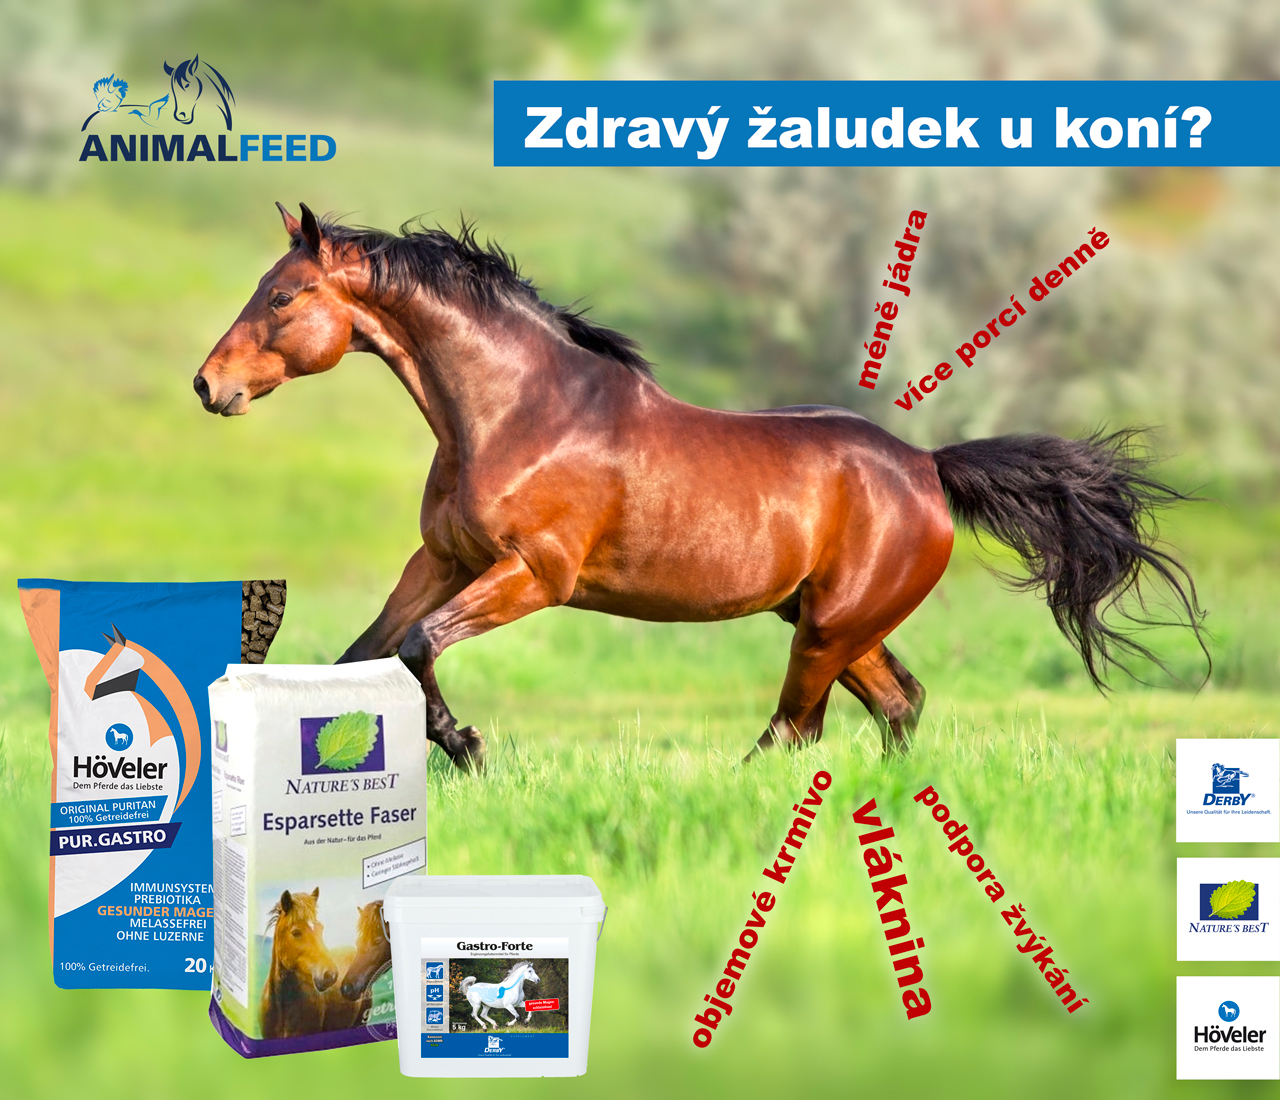 Zdravy_zaludek_u_koni